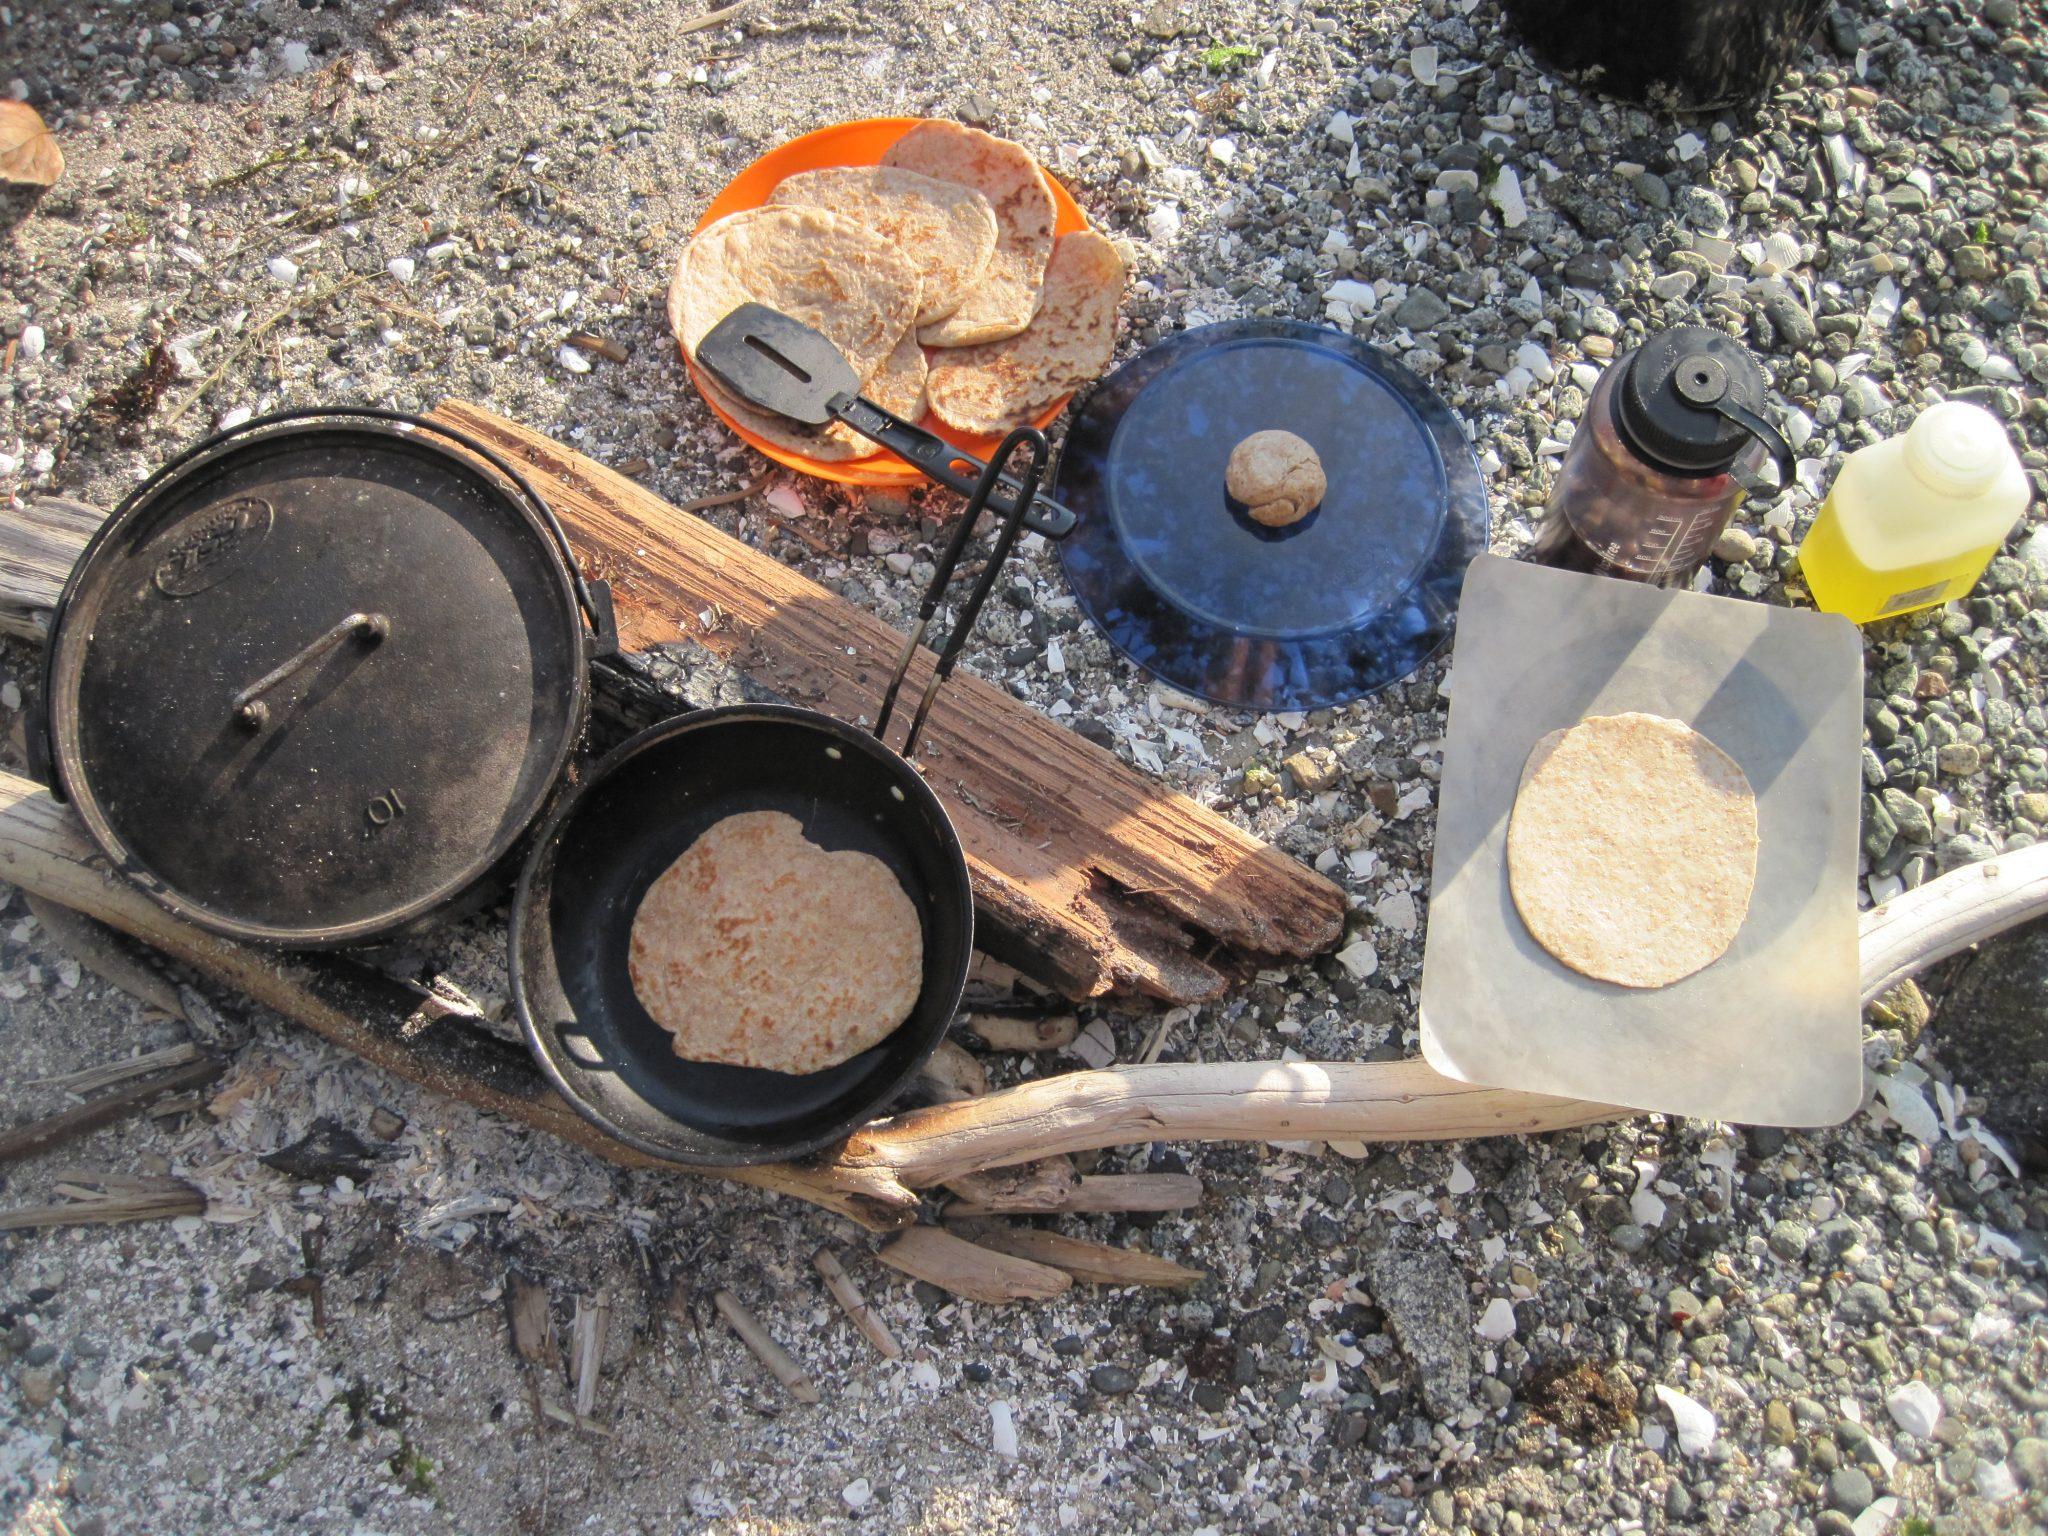 Sea Kayaking & Making Tortillas: The Simple Act of Living